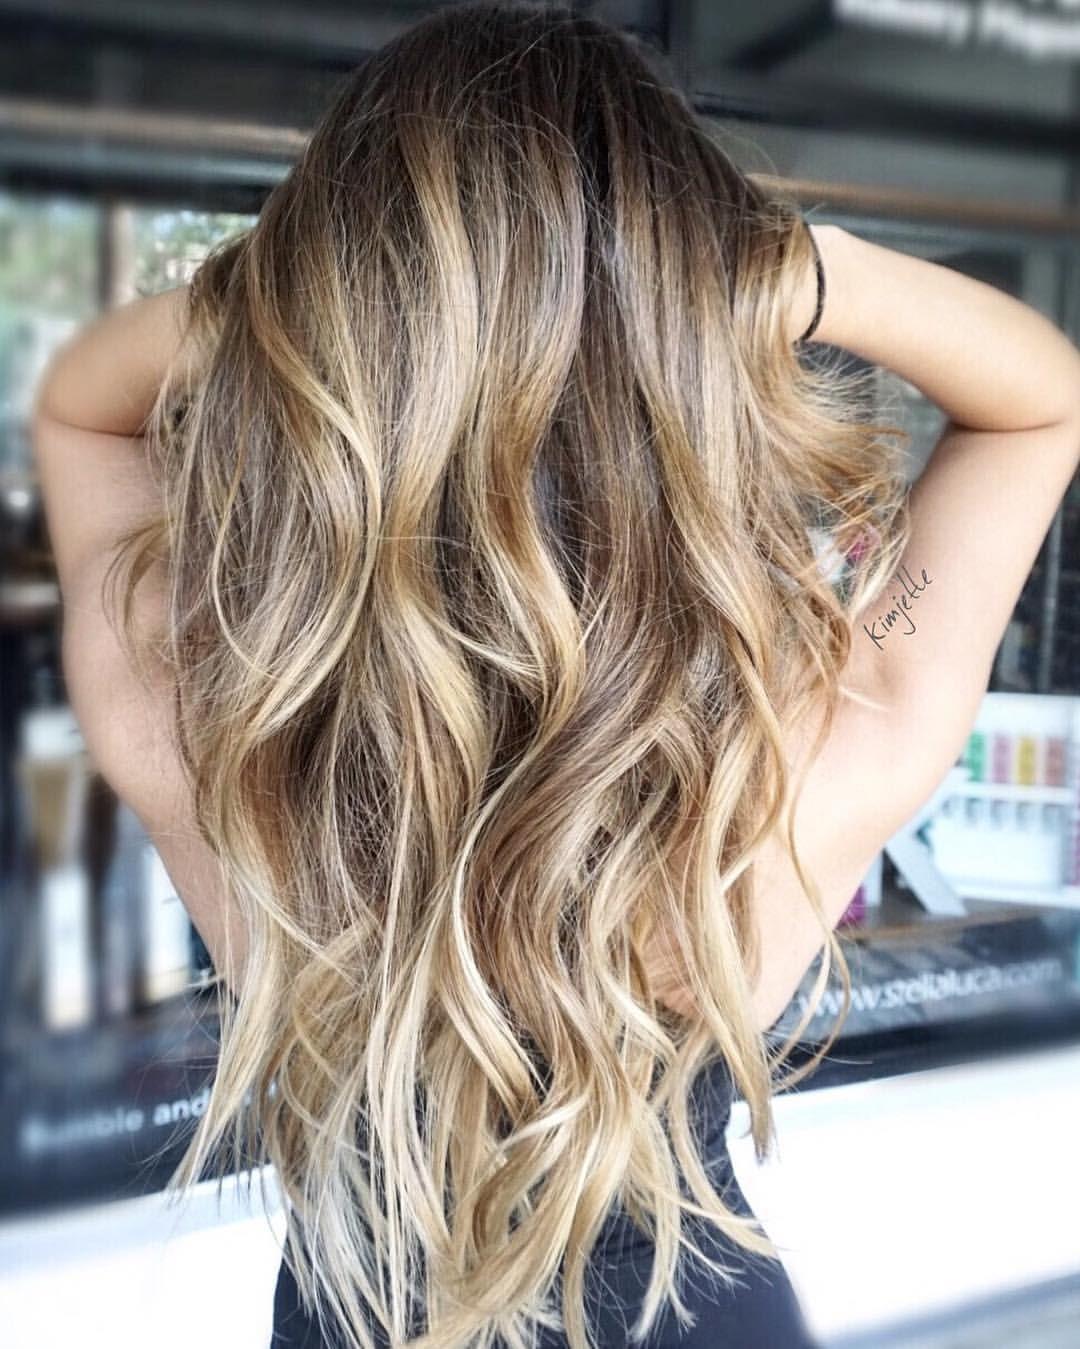 Hairpaitning #hairbykimjette #balayage #hairpainting #honeyblonde @kimjettehair (at Stella Luca Salons - Winter Park's Balayage & Hair Extensions Salon)